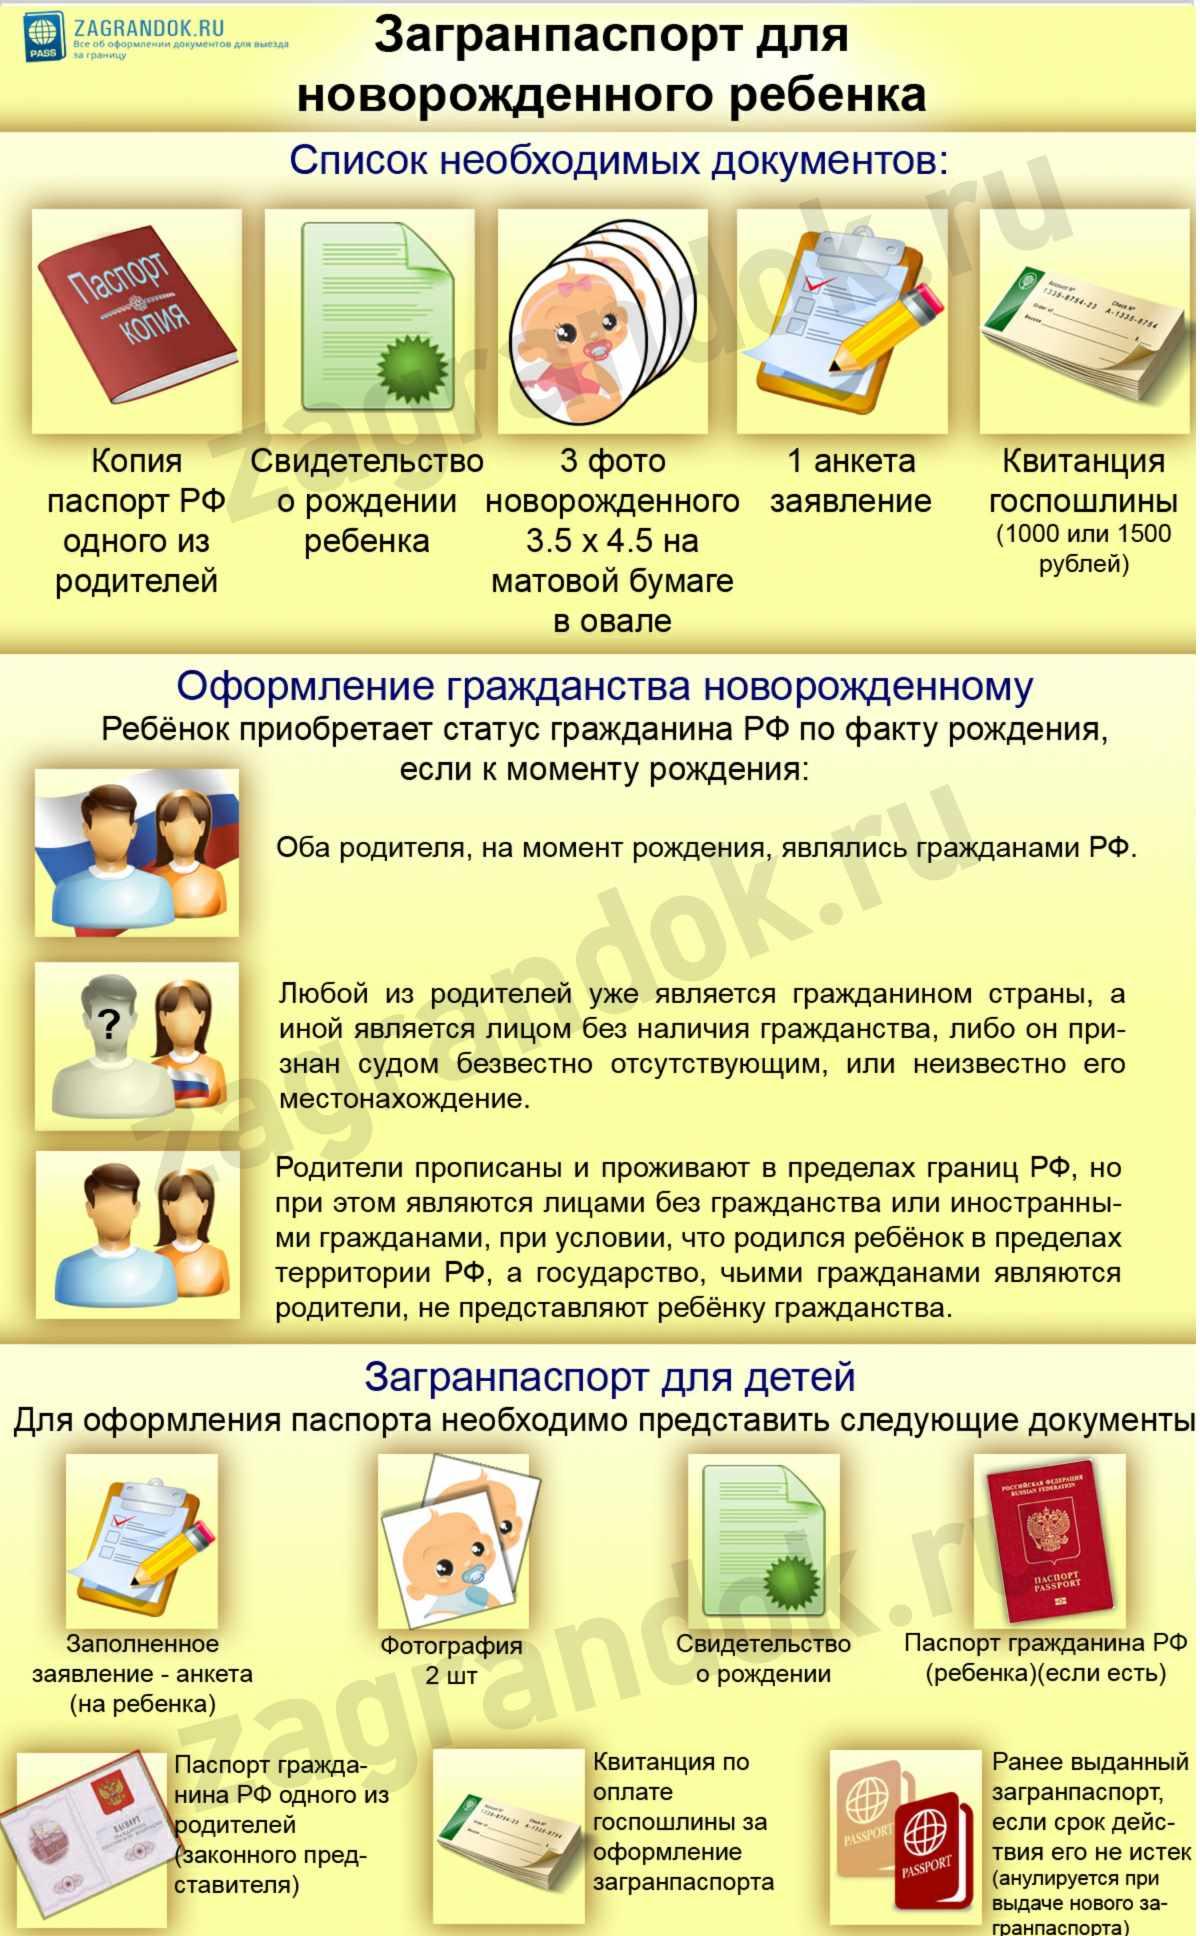 Загранпаспорт для новорожденного ребенка